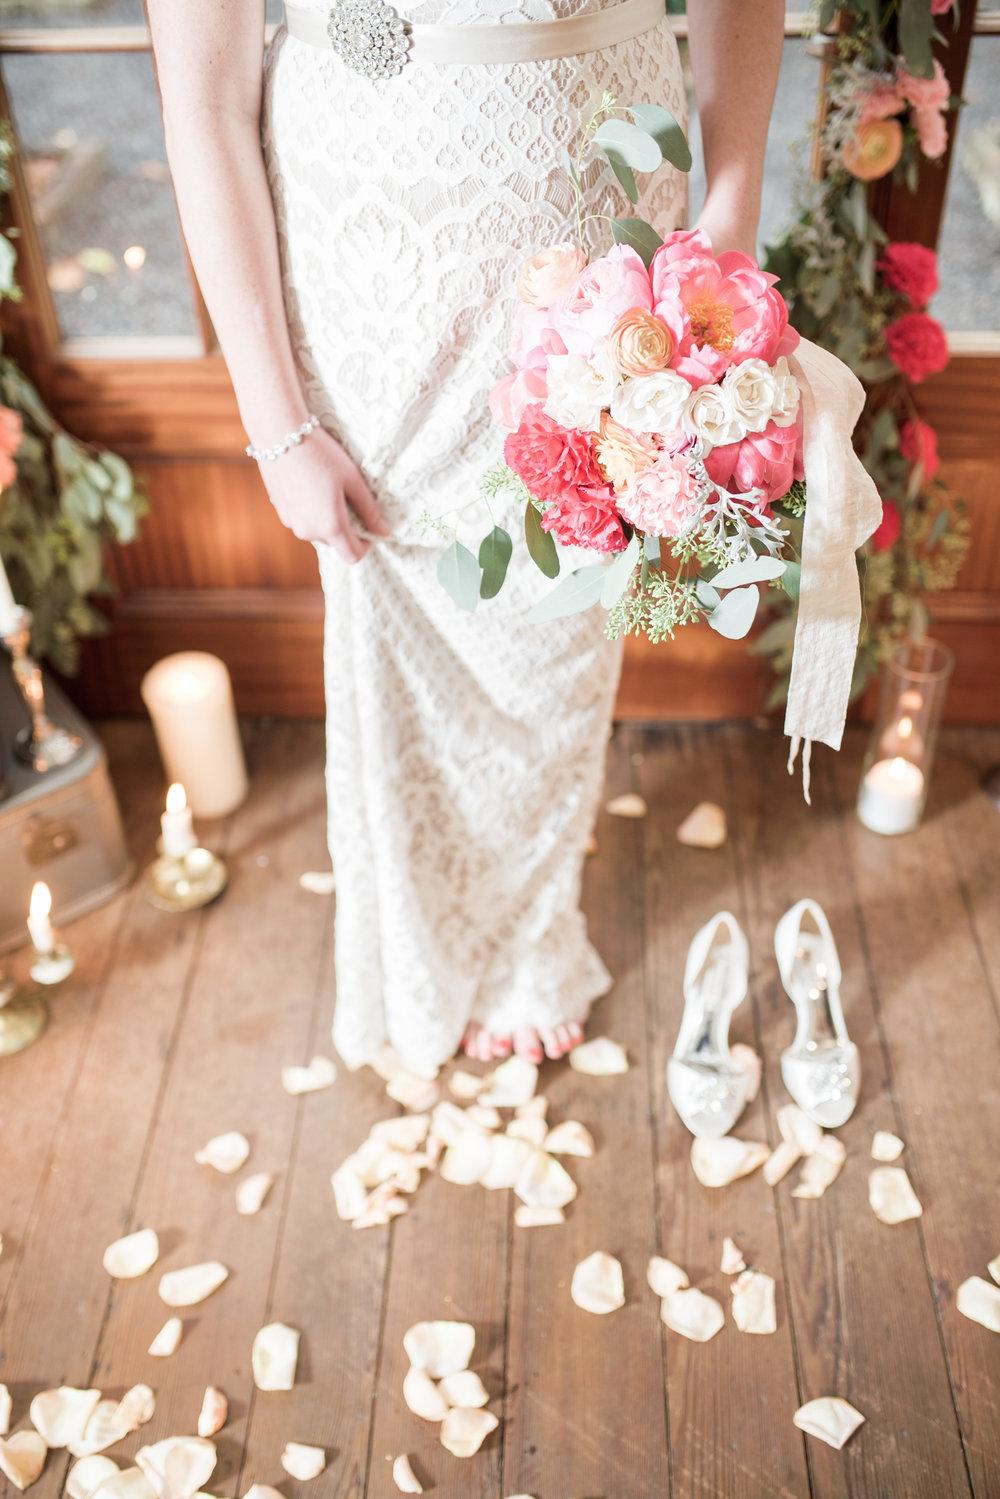 charleston elopement planners, scarlet plan & design, coral, tangerine, hot pink, peach intimate wedding (57).jpg